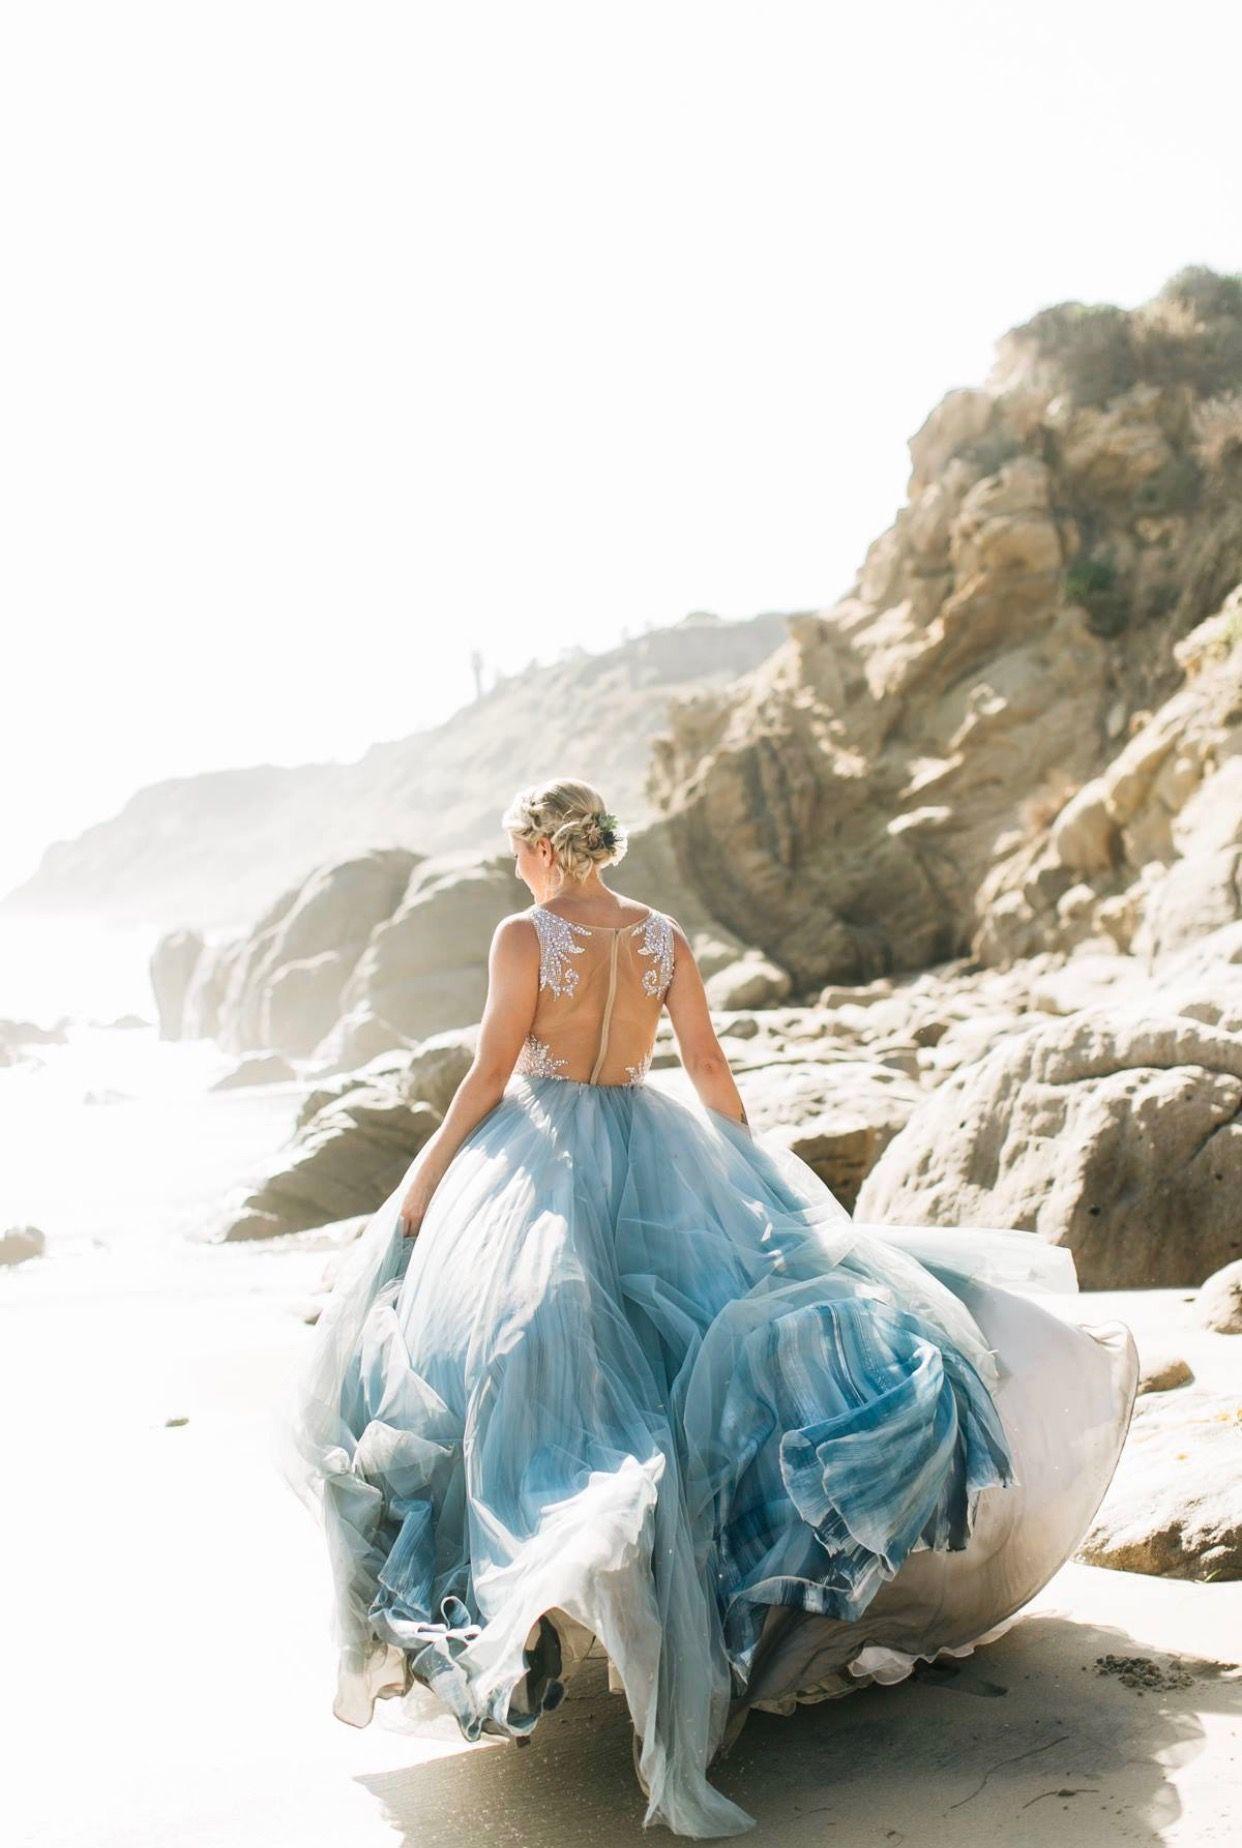 Hayley paige kenny gown chantel lauren steel blue mae skirt